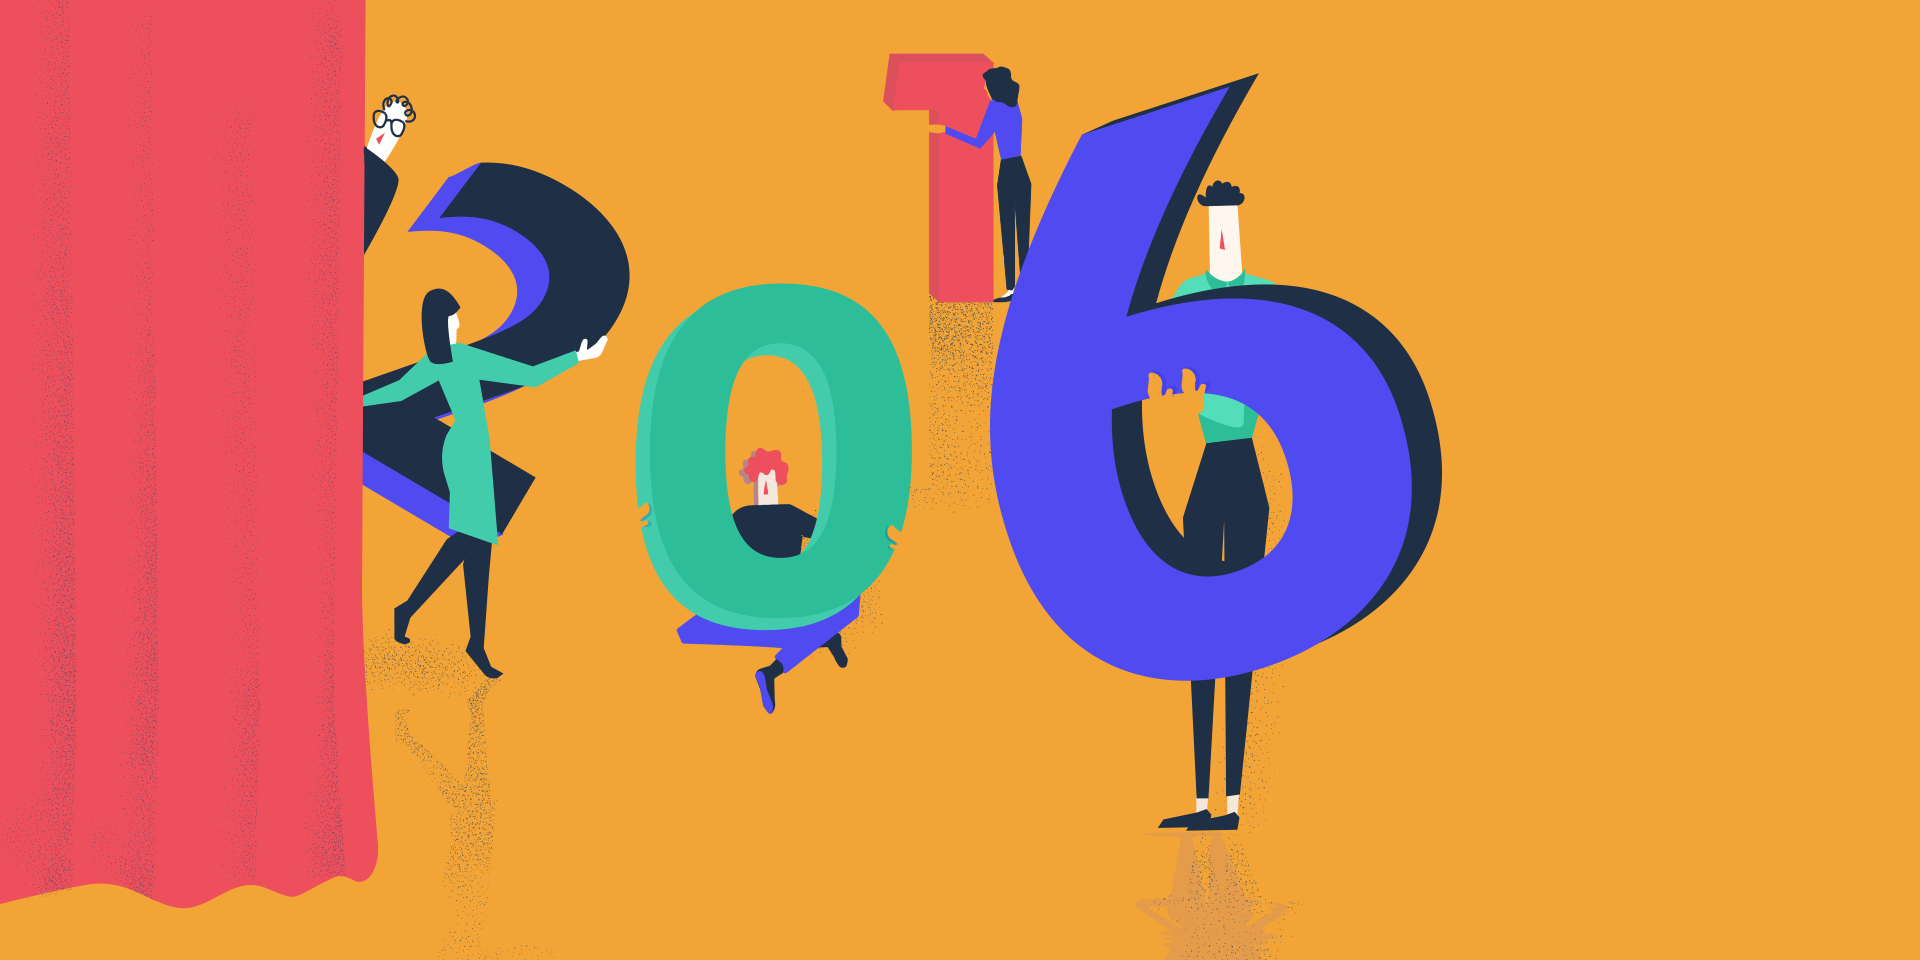 2016 rok za kulisami Prowly